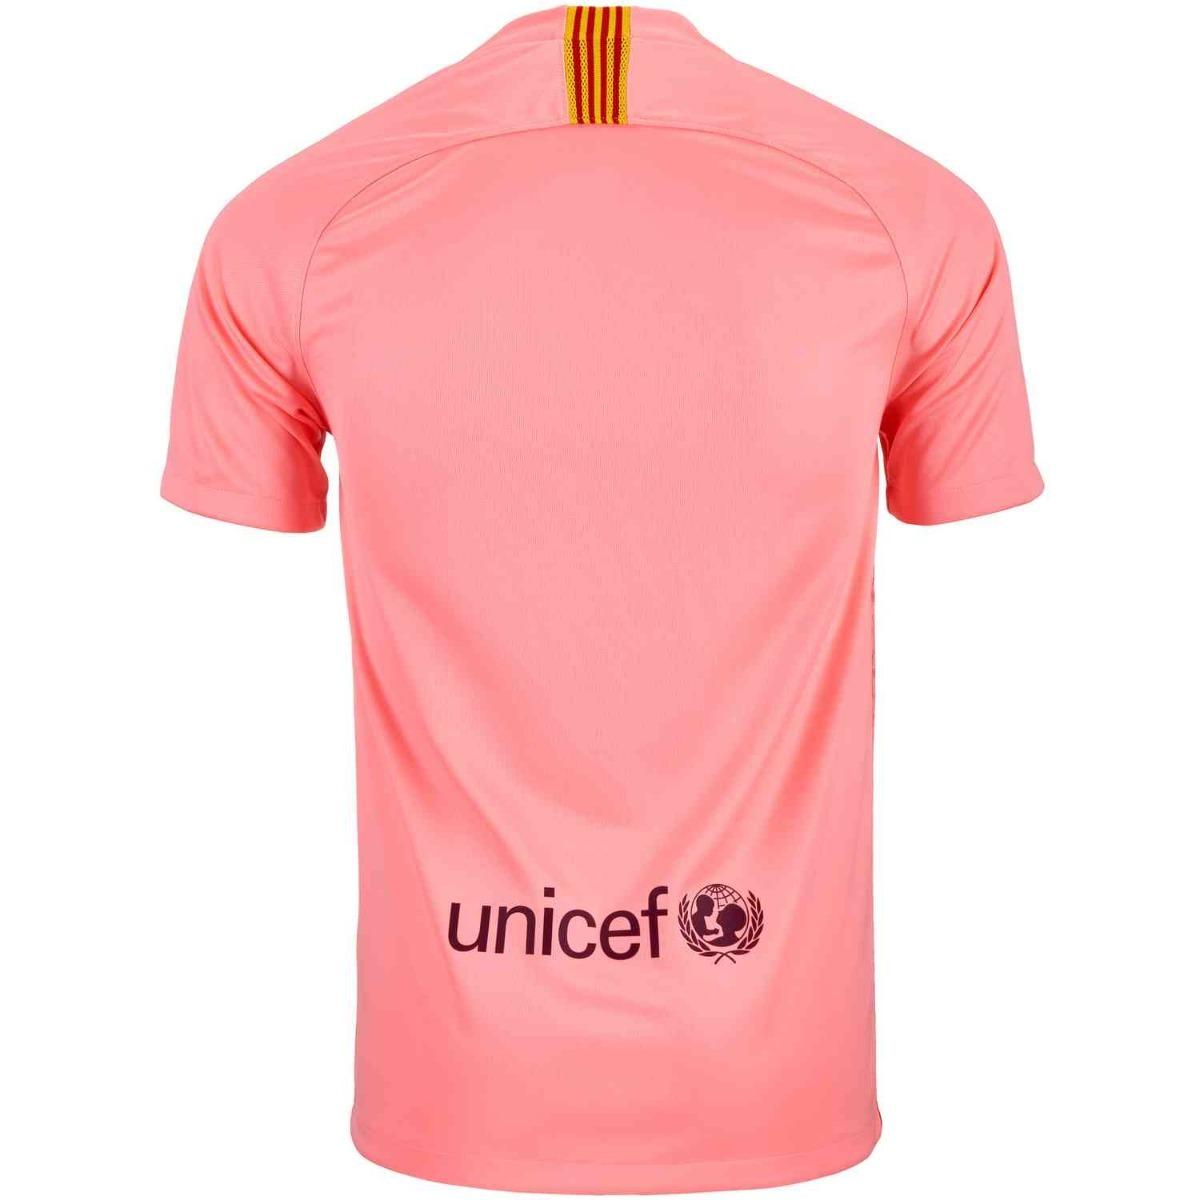 1eebfad8b4 Camisa Barcelona Rosa 18-19 ( Pronta Enterga ) Prod N br - R  139